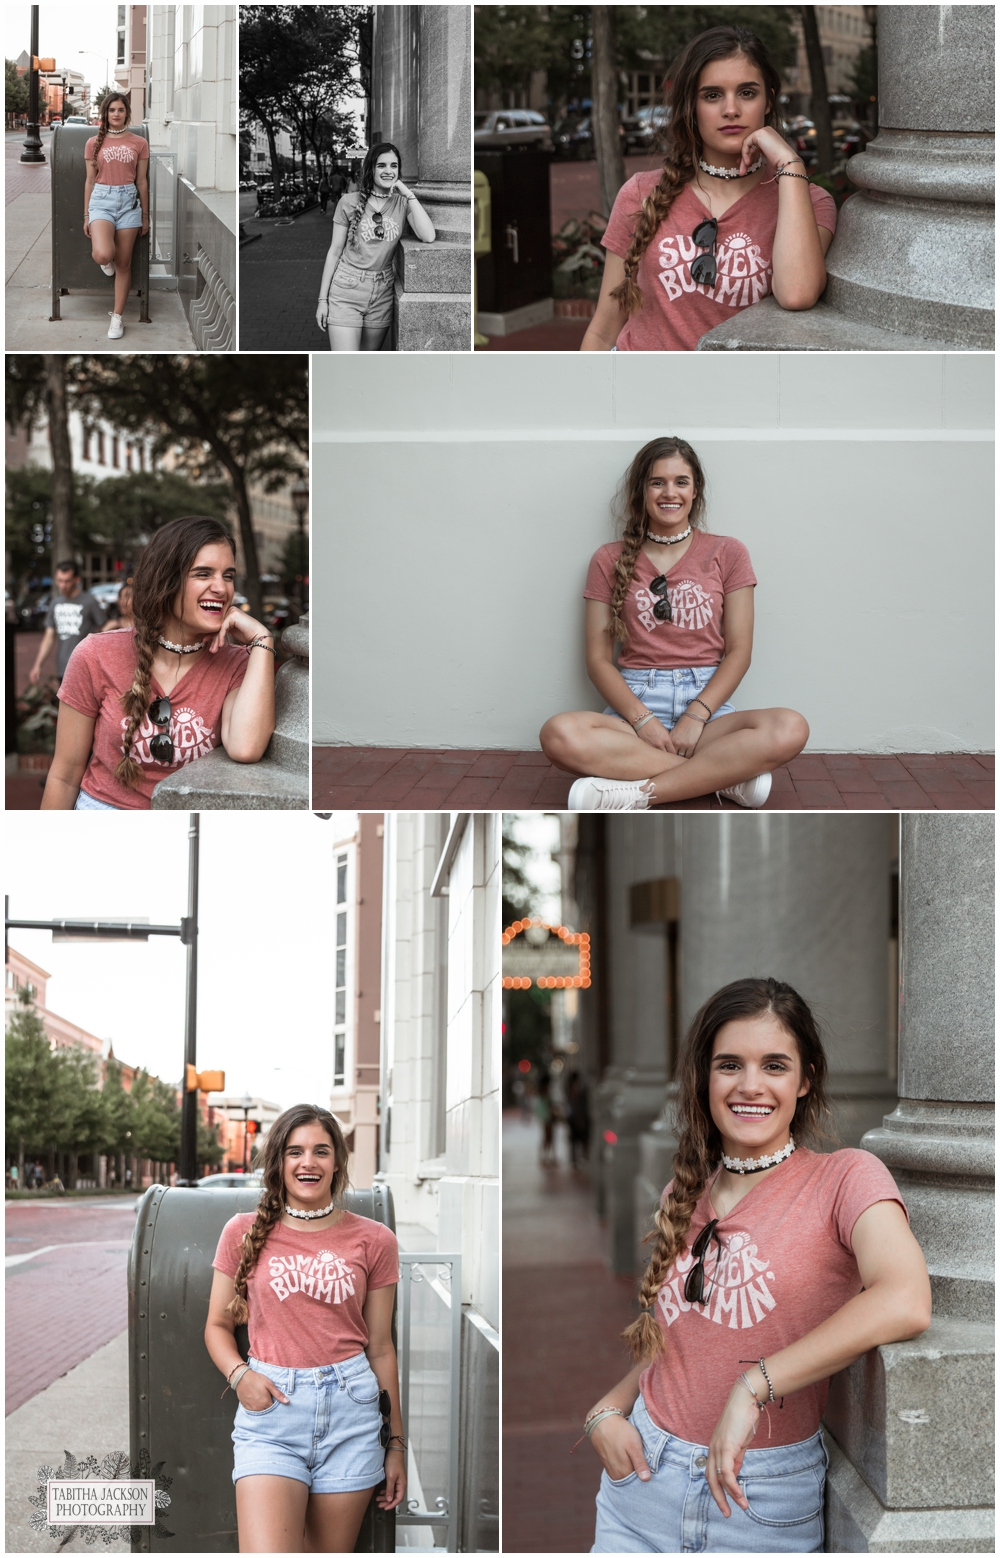 Arlington Texas Senior Photography 1.jpg